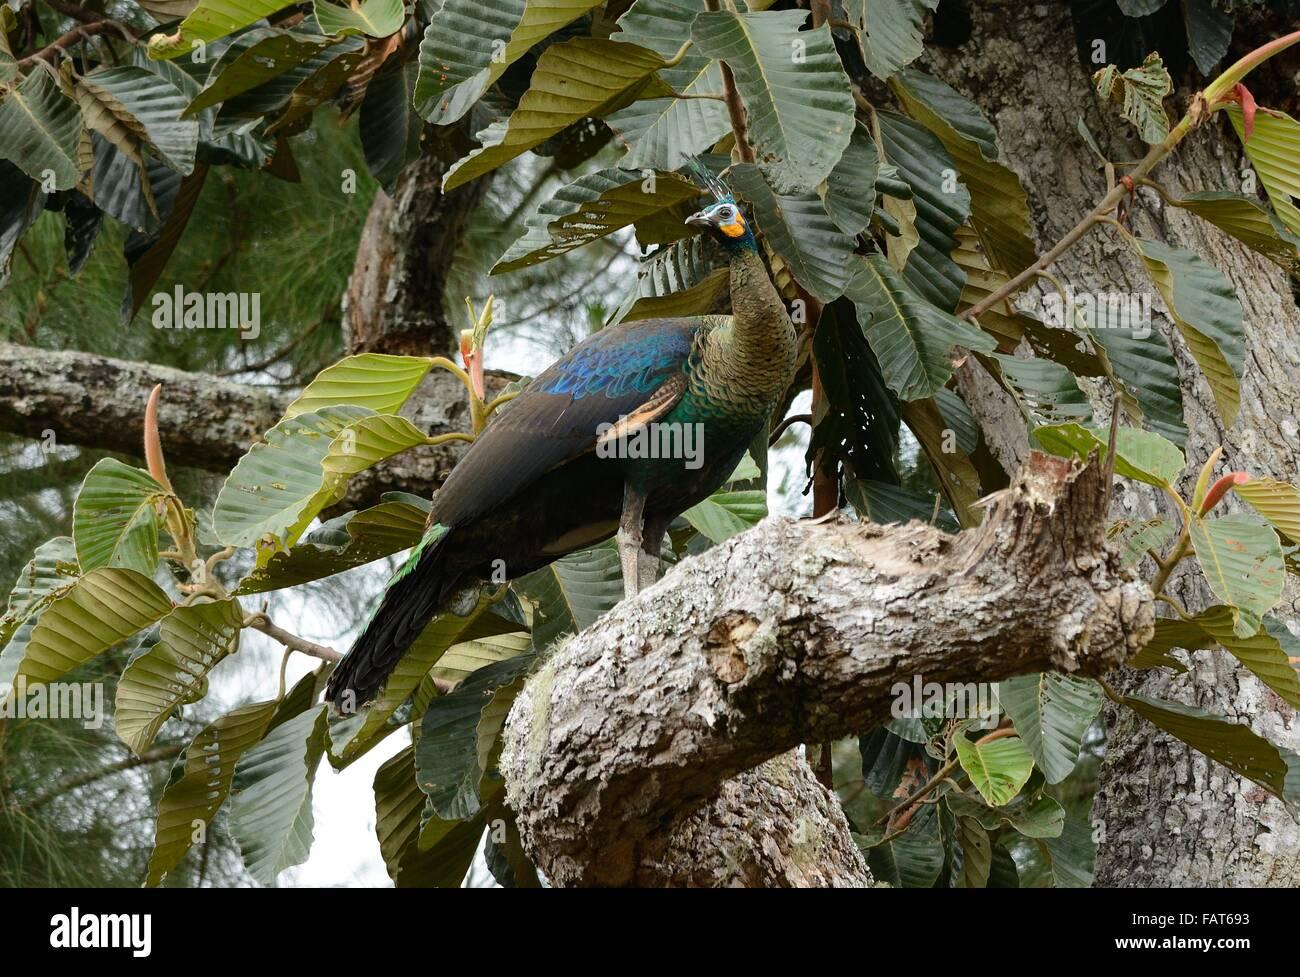 beautiful female Green Peafowl (Pavo muticus) inThai forest - Stock Image